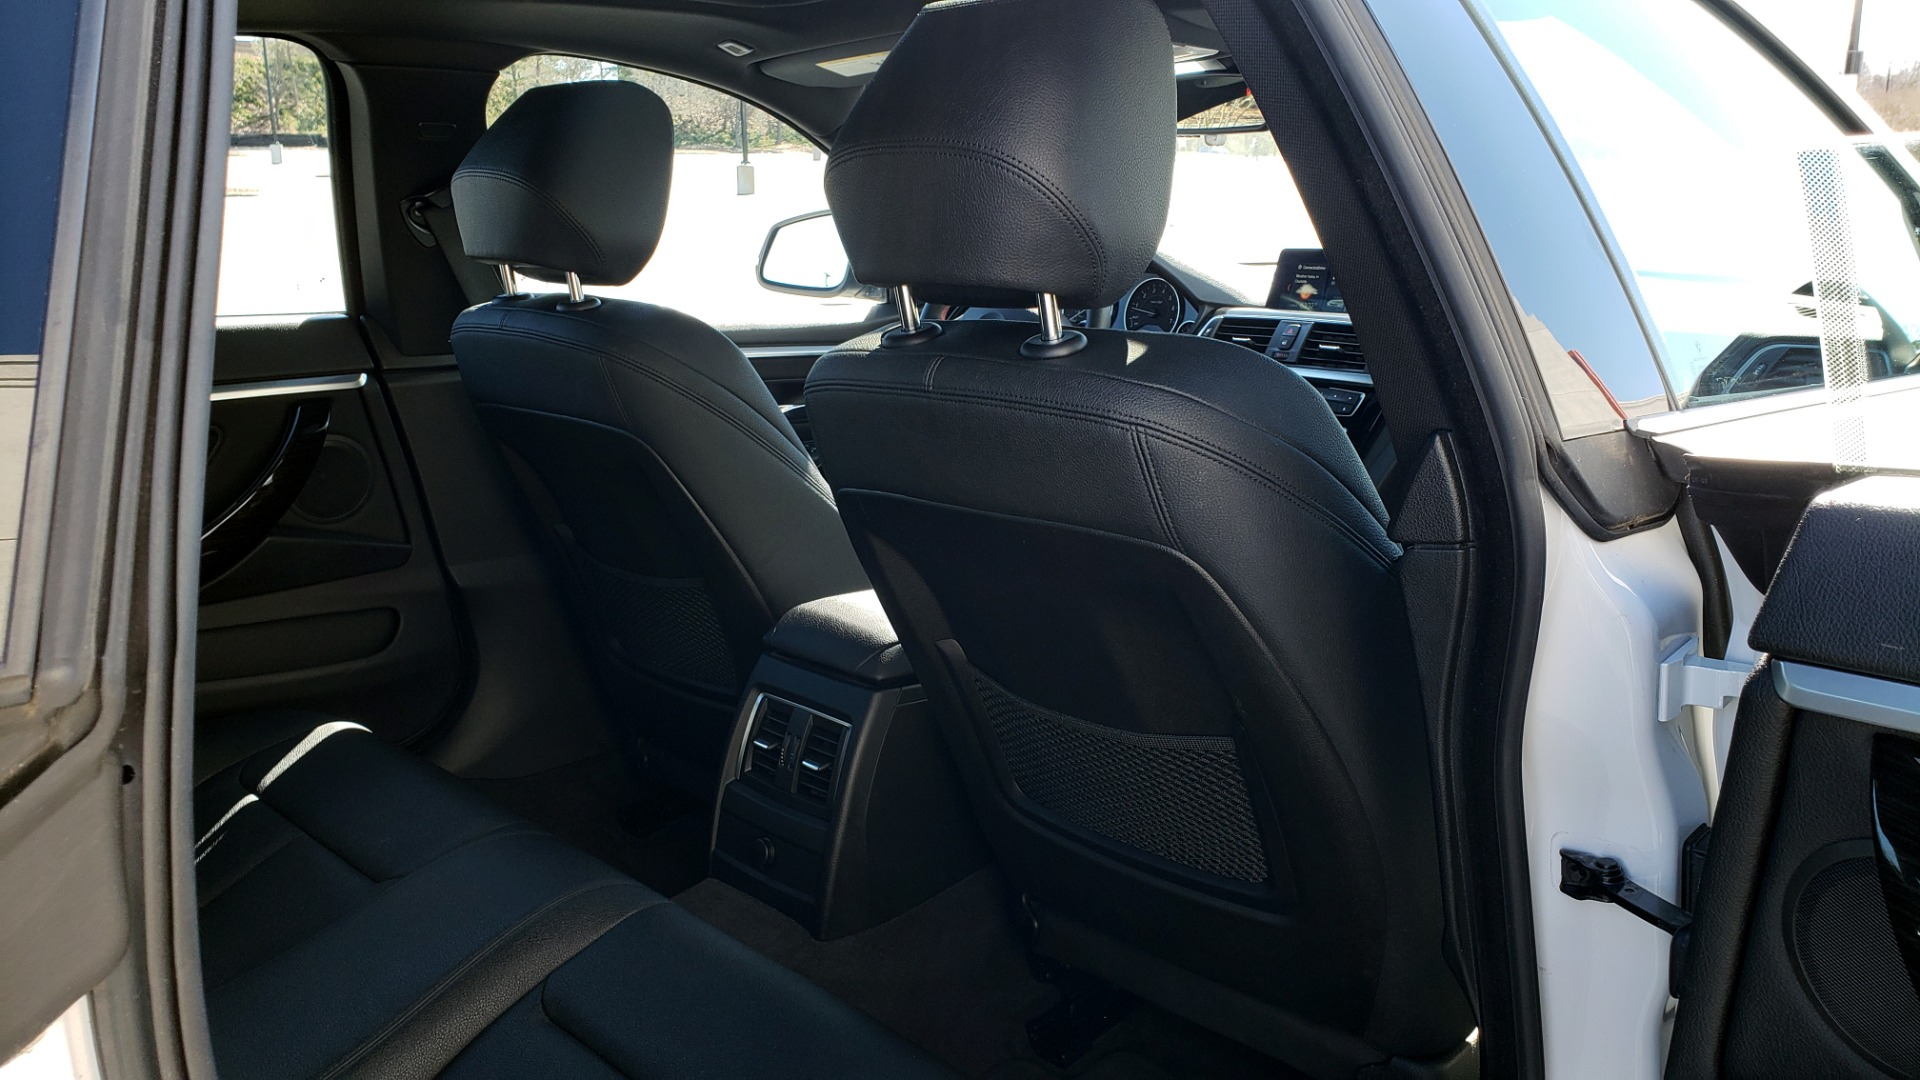 Used 2018 BMW 4 SERIES 430IXDRIVE / PREMIUM / NAV / SUNROOF / ESSENTIALS PKG for sale $28,995 at Formula Imports in Charlotte NC 28227 78